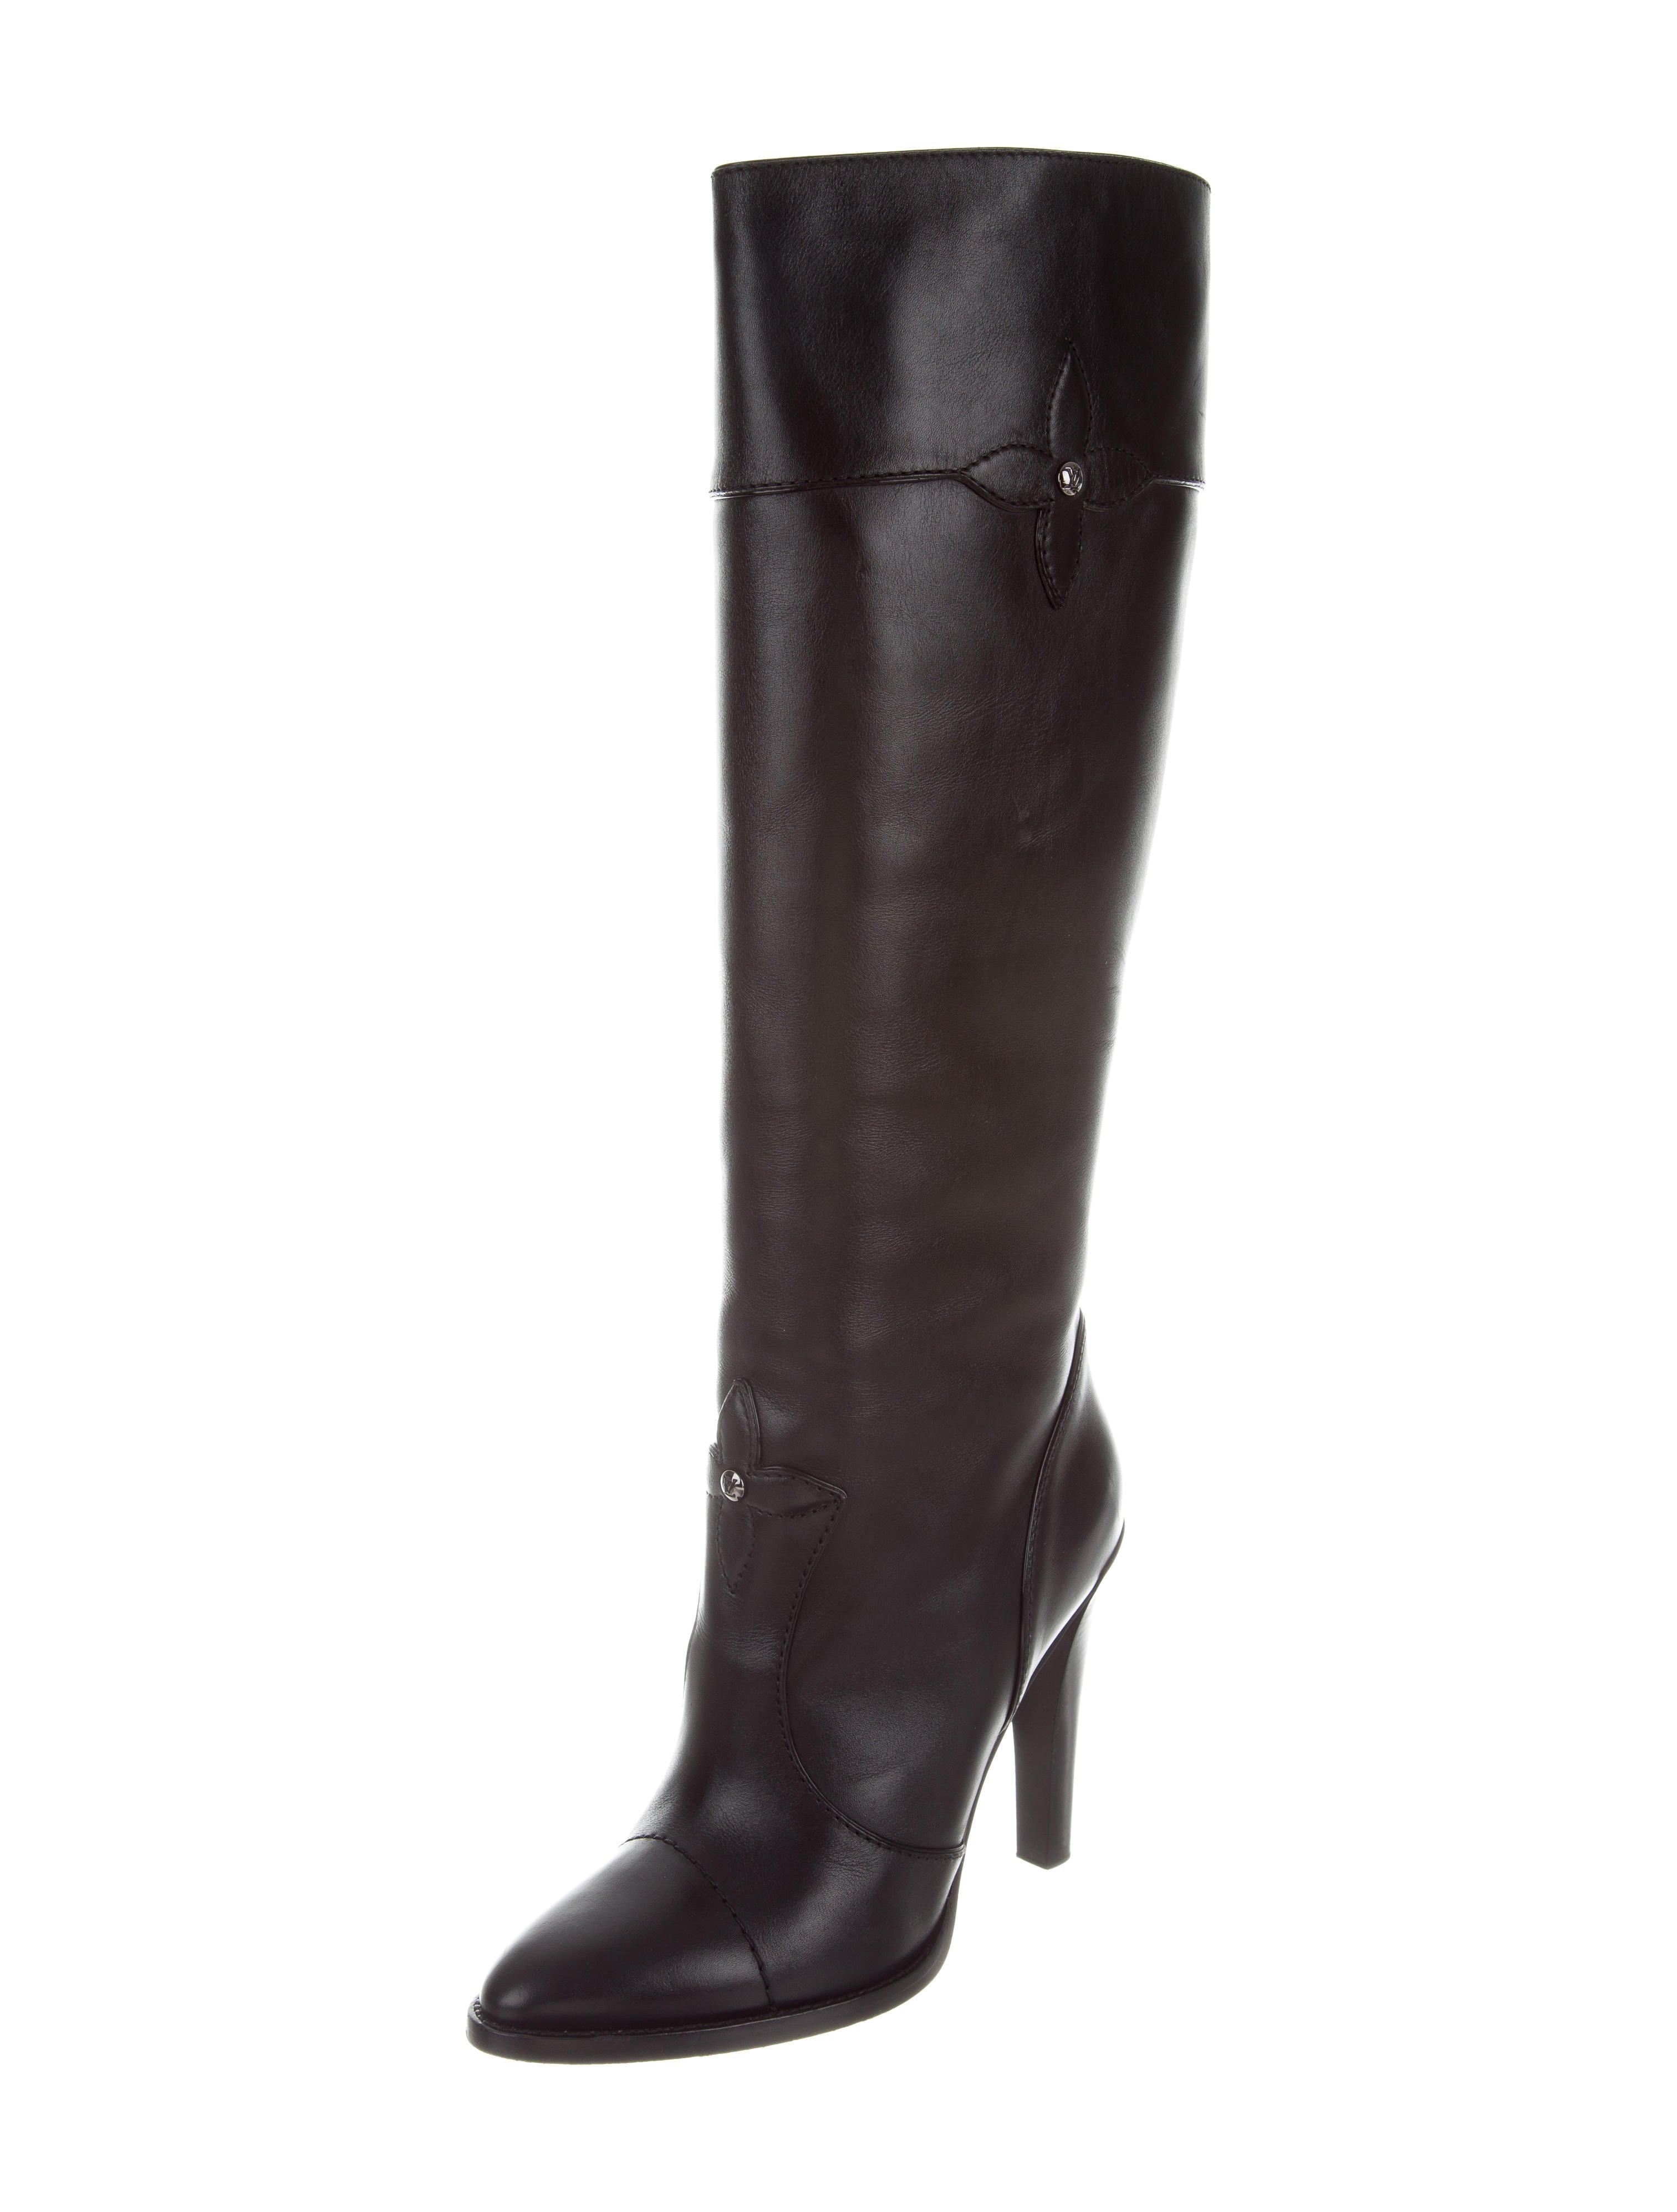 3004d3098fc Louis Vuitton Leather Knee-High Boots - Shoes - LOU125000 .